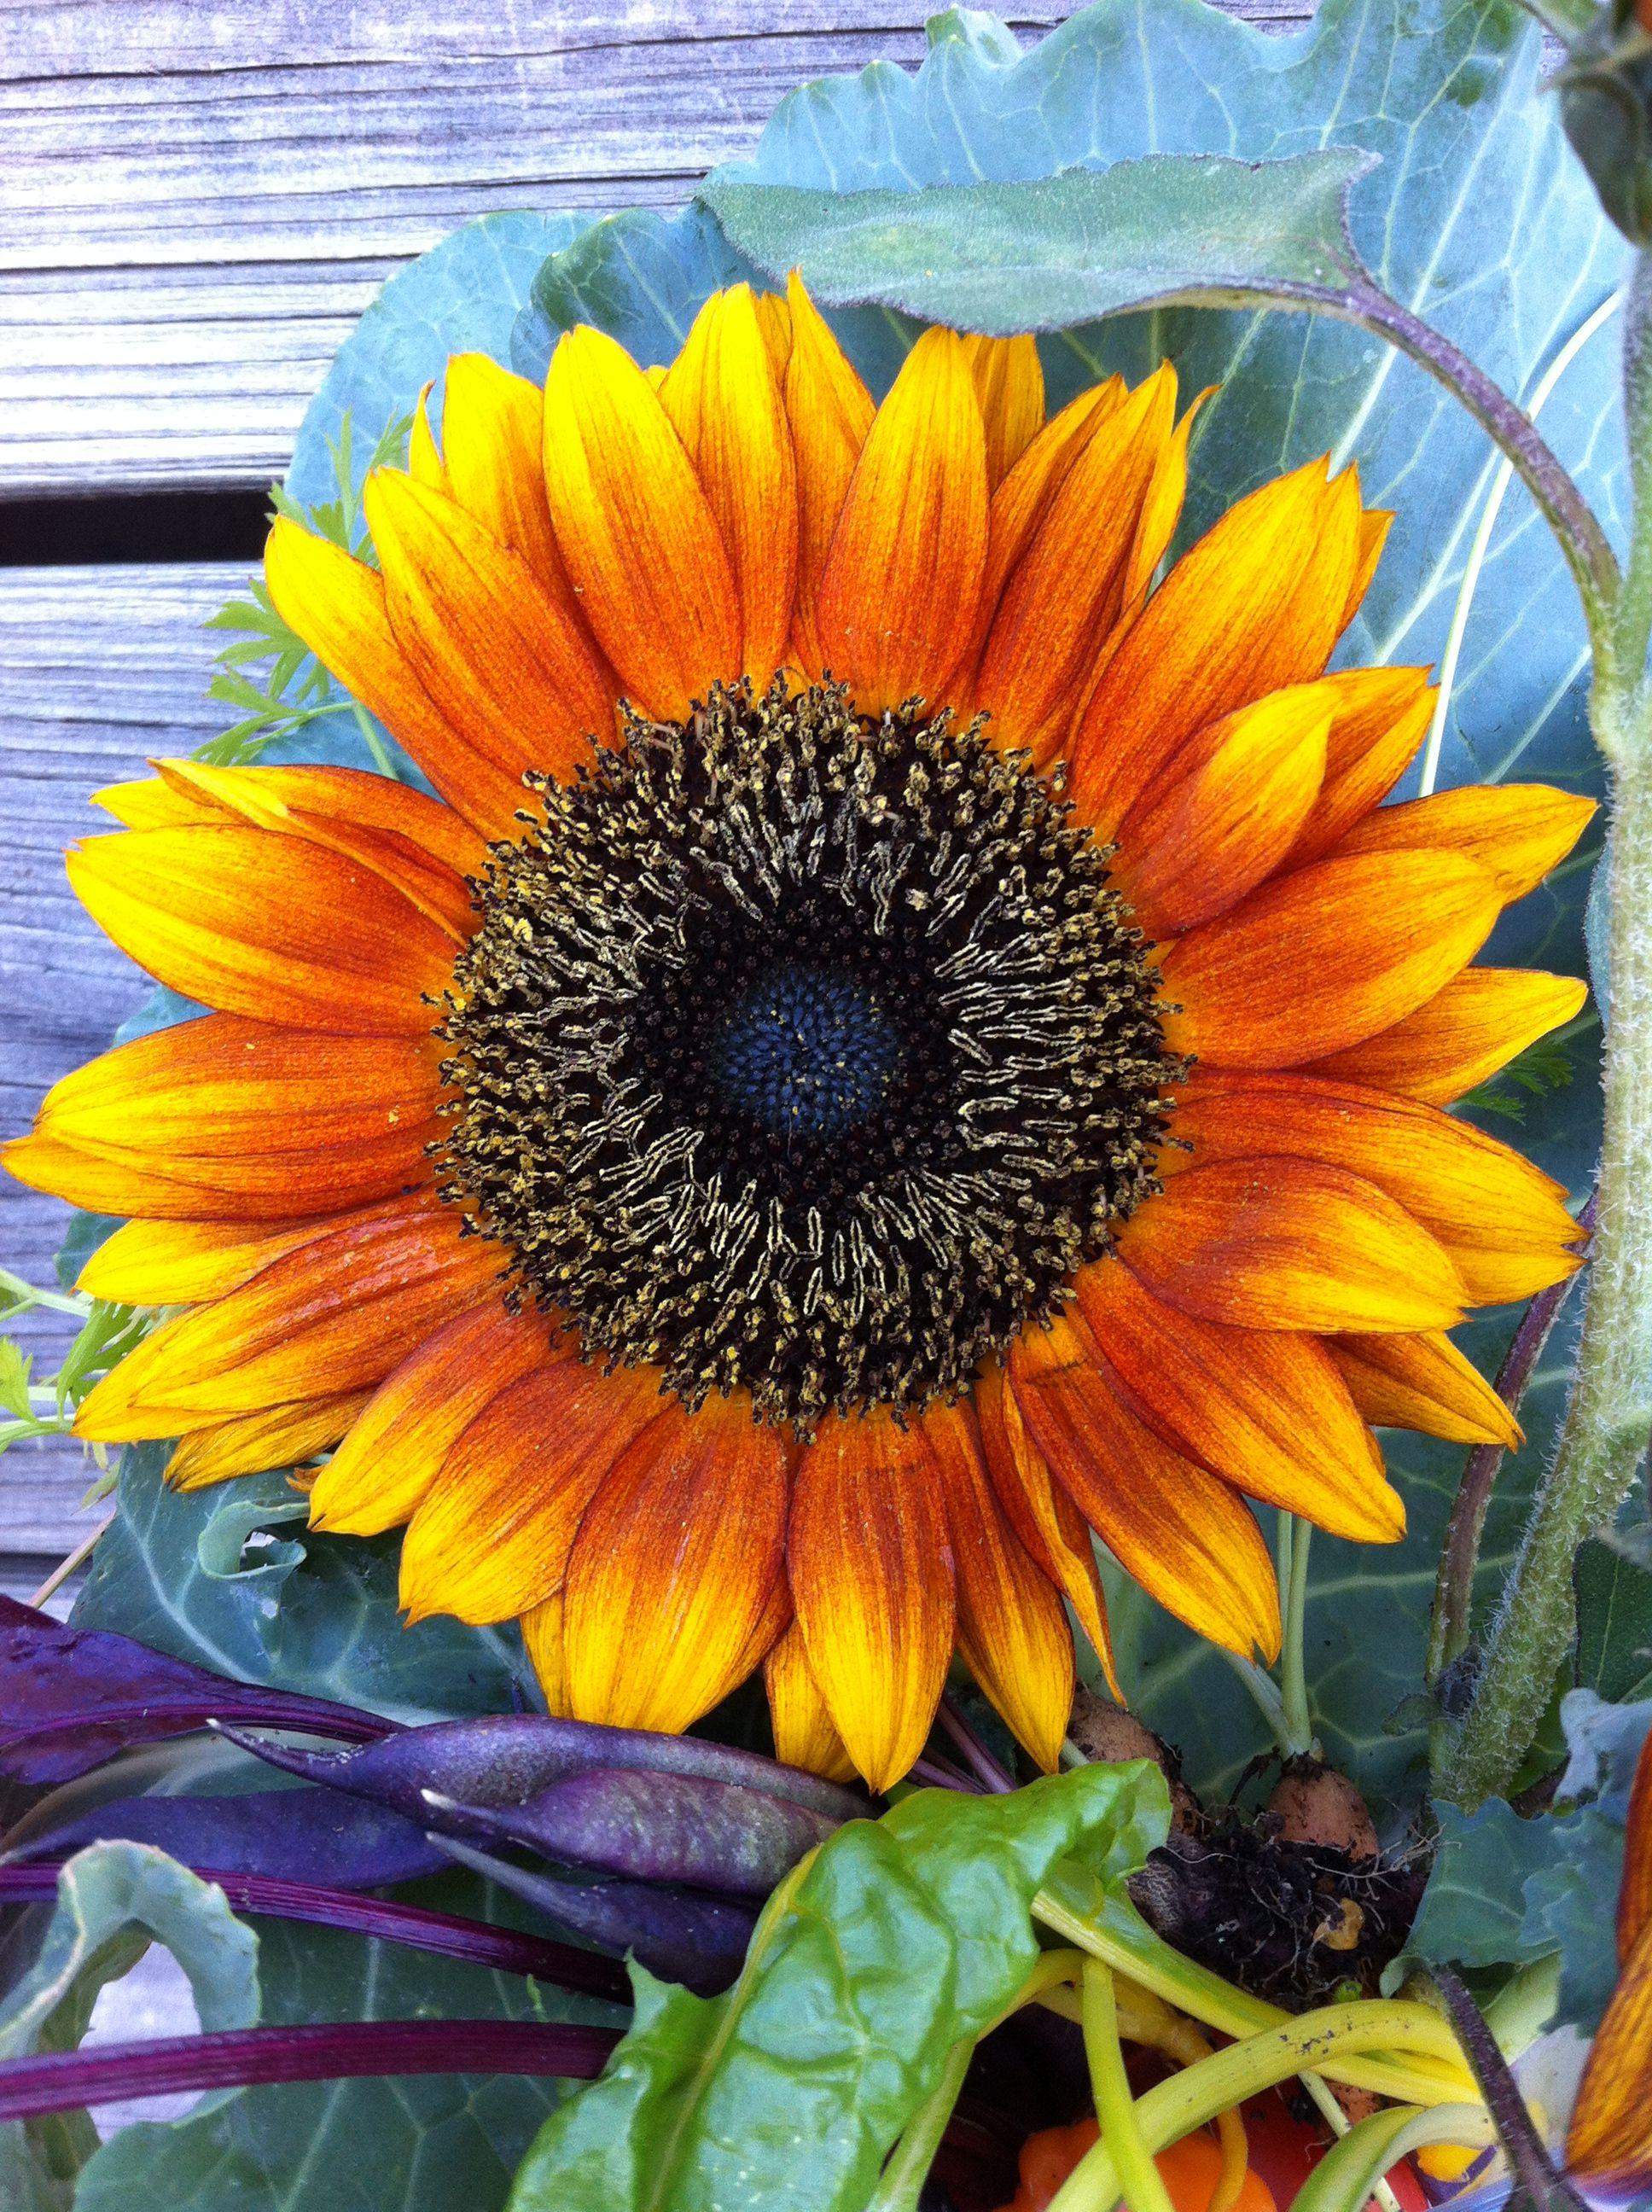 Sunflower! Garden harvest